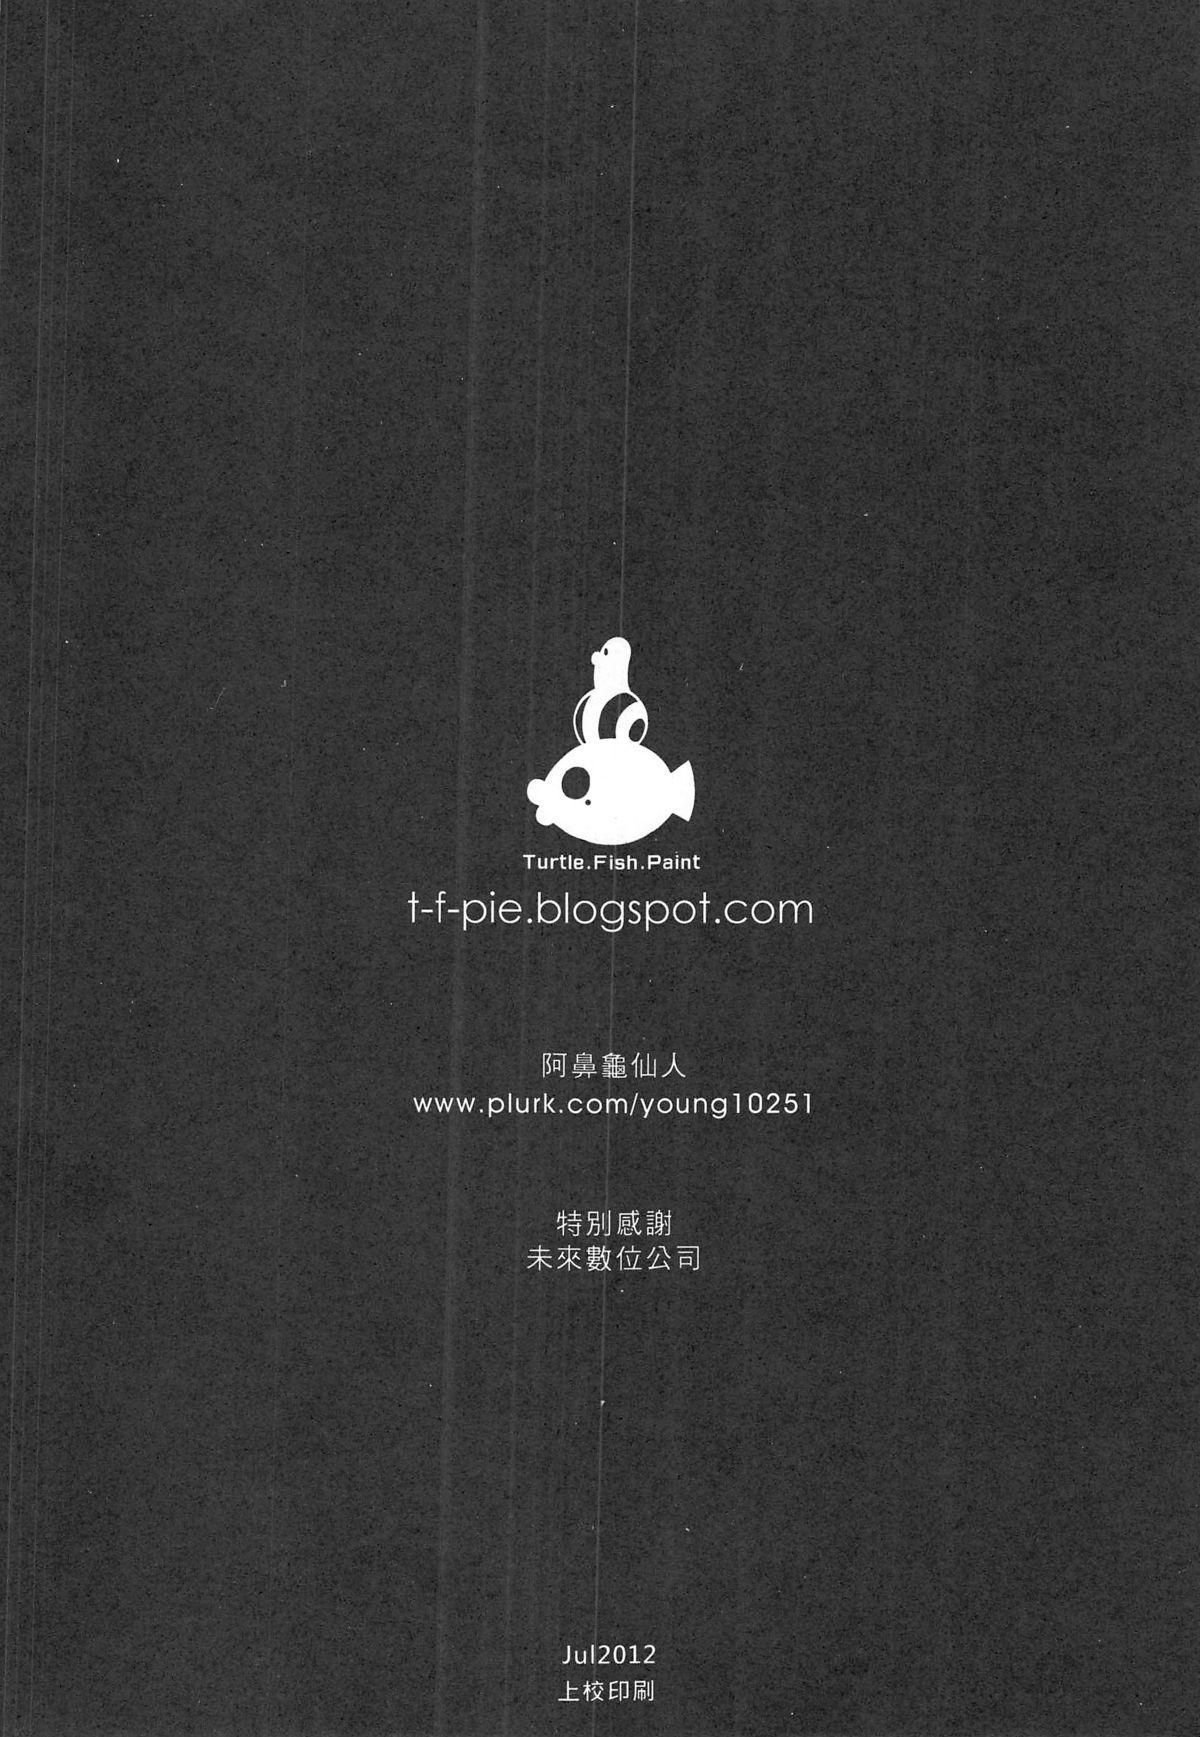 (CWT-K11) [Turtle.Fish.Paint (Abi Kamesennin)] Dounen Hakai #02 ~Kokugo no Kyouka‧sho~ Vol. 1 [Chinese] 21